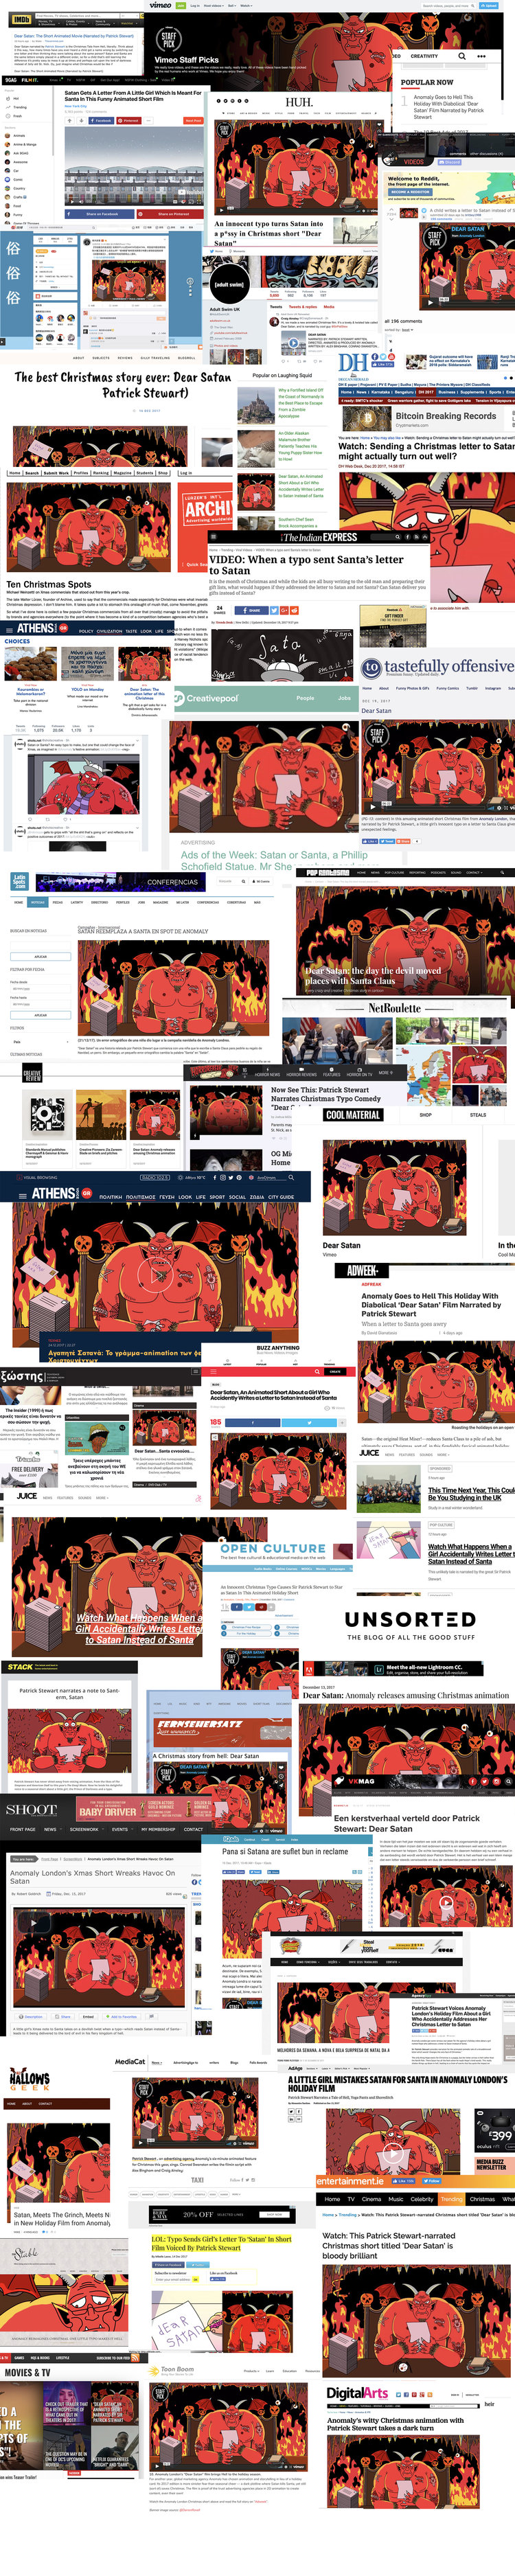 satan+media2.jpg